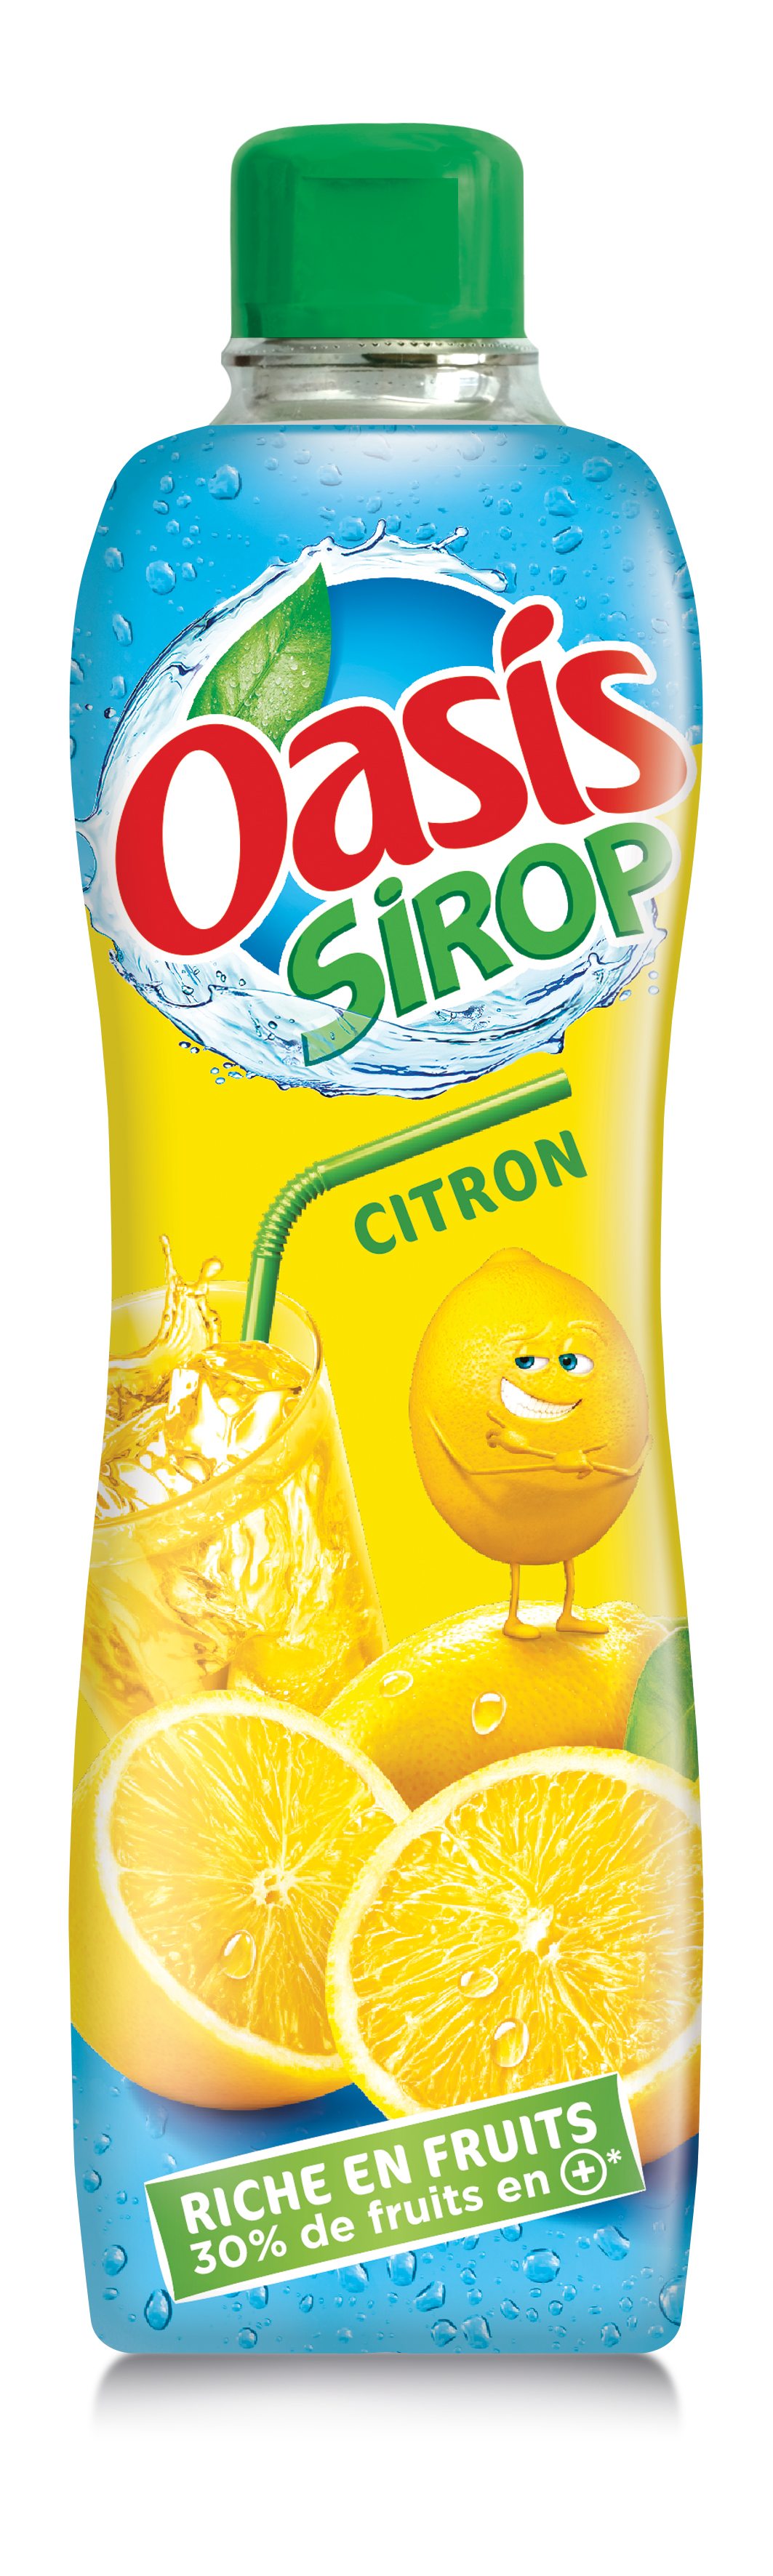 Citron - Oasis lance sa première gamme de sirops